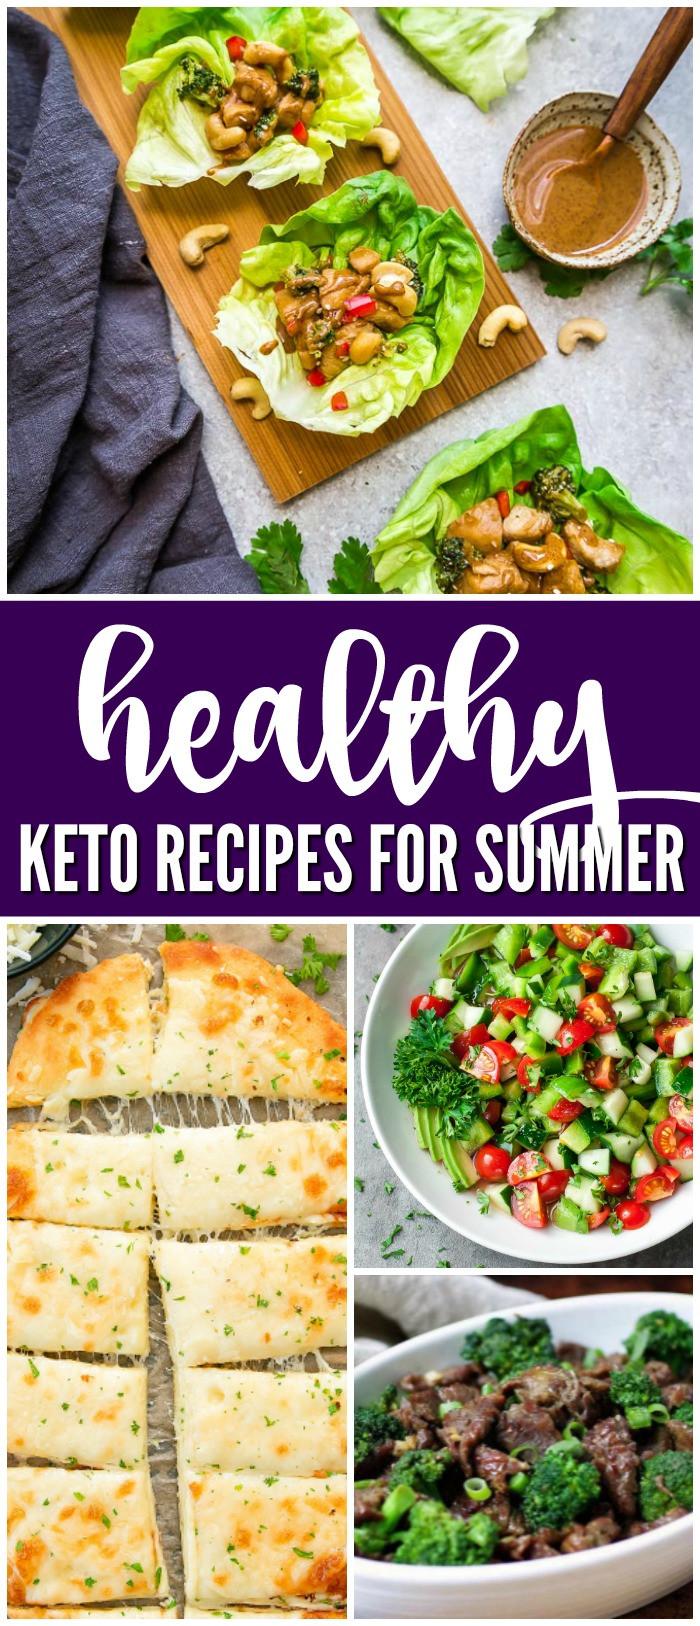 Healthy Keto Recipes  Healthy Keto Recipes for Summer